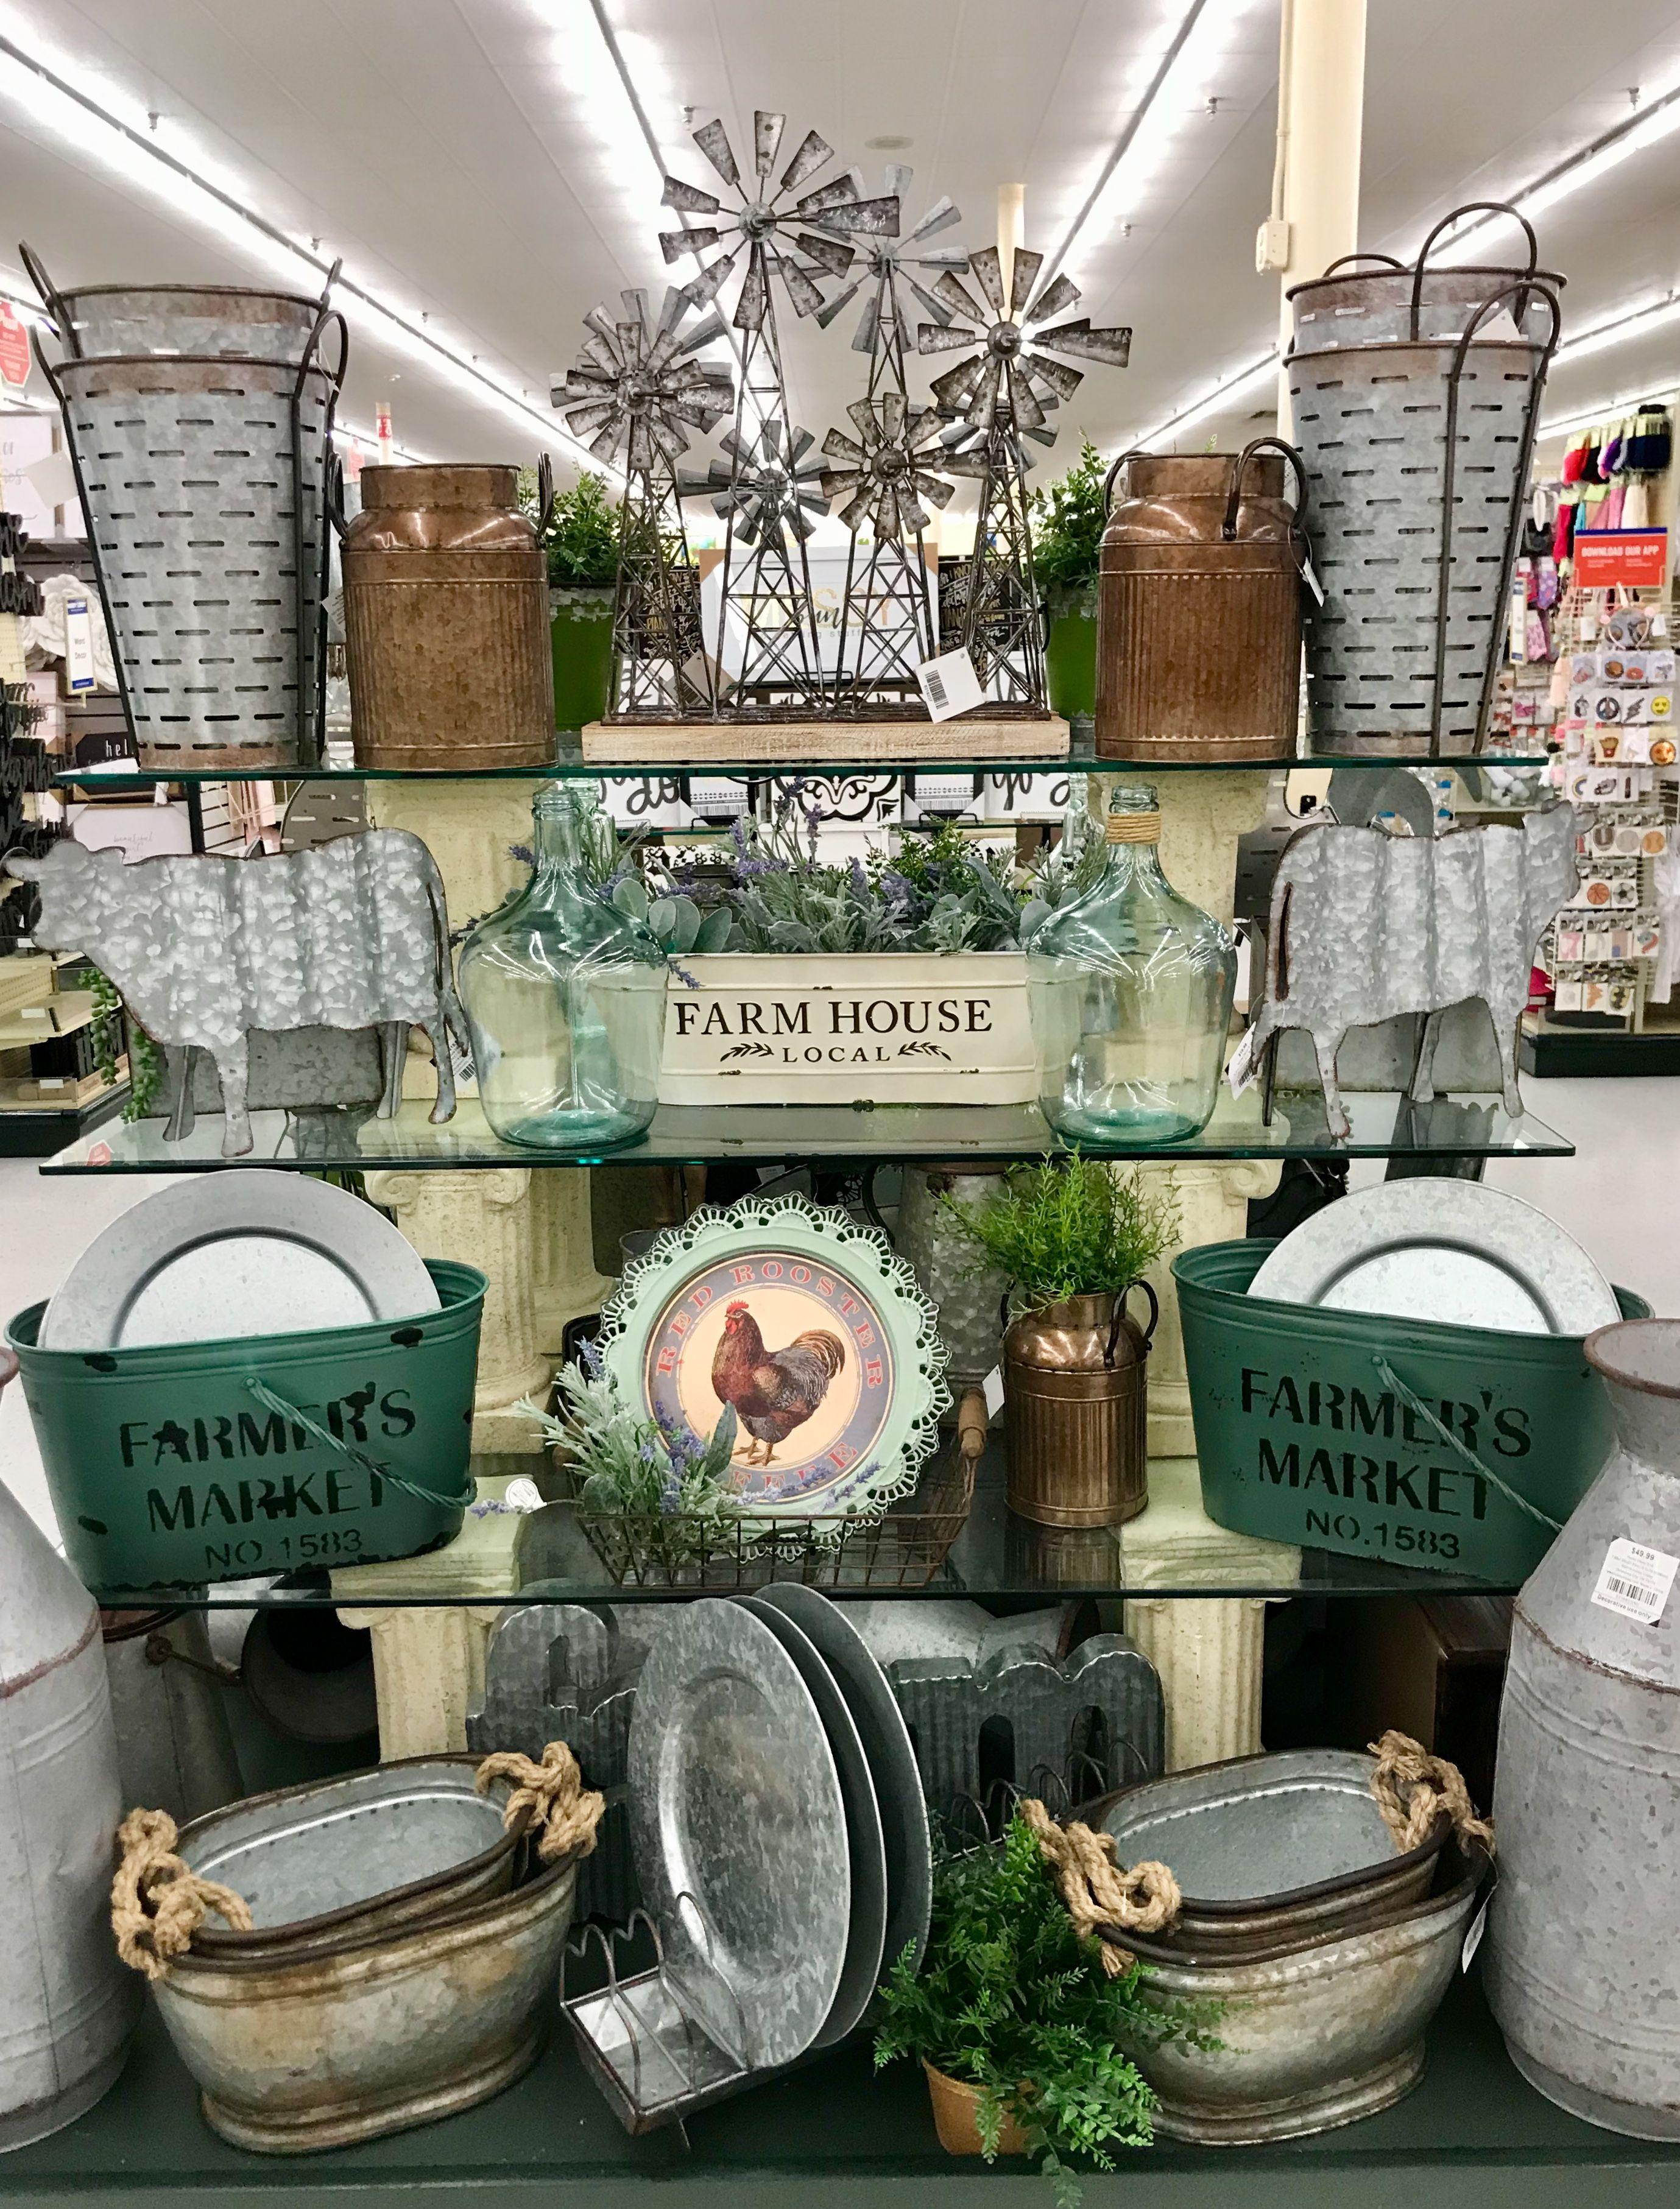 Hobby lobby merchandising table displays work Farmhouse